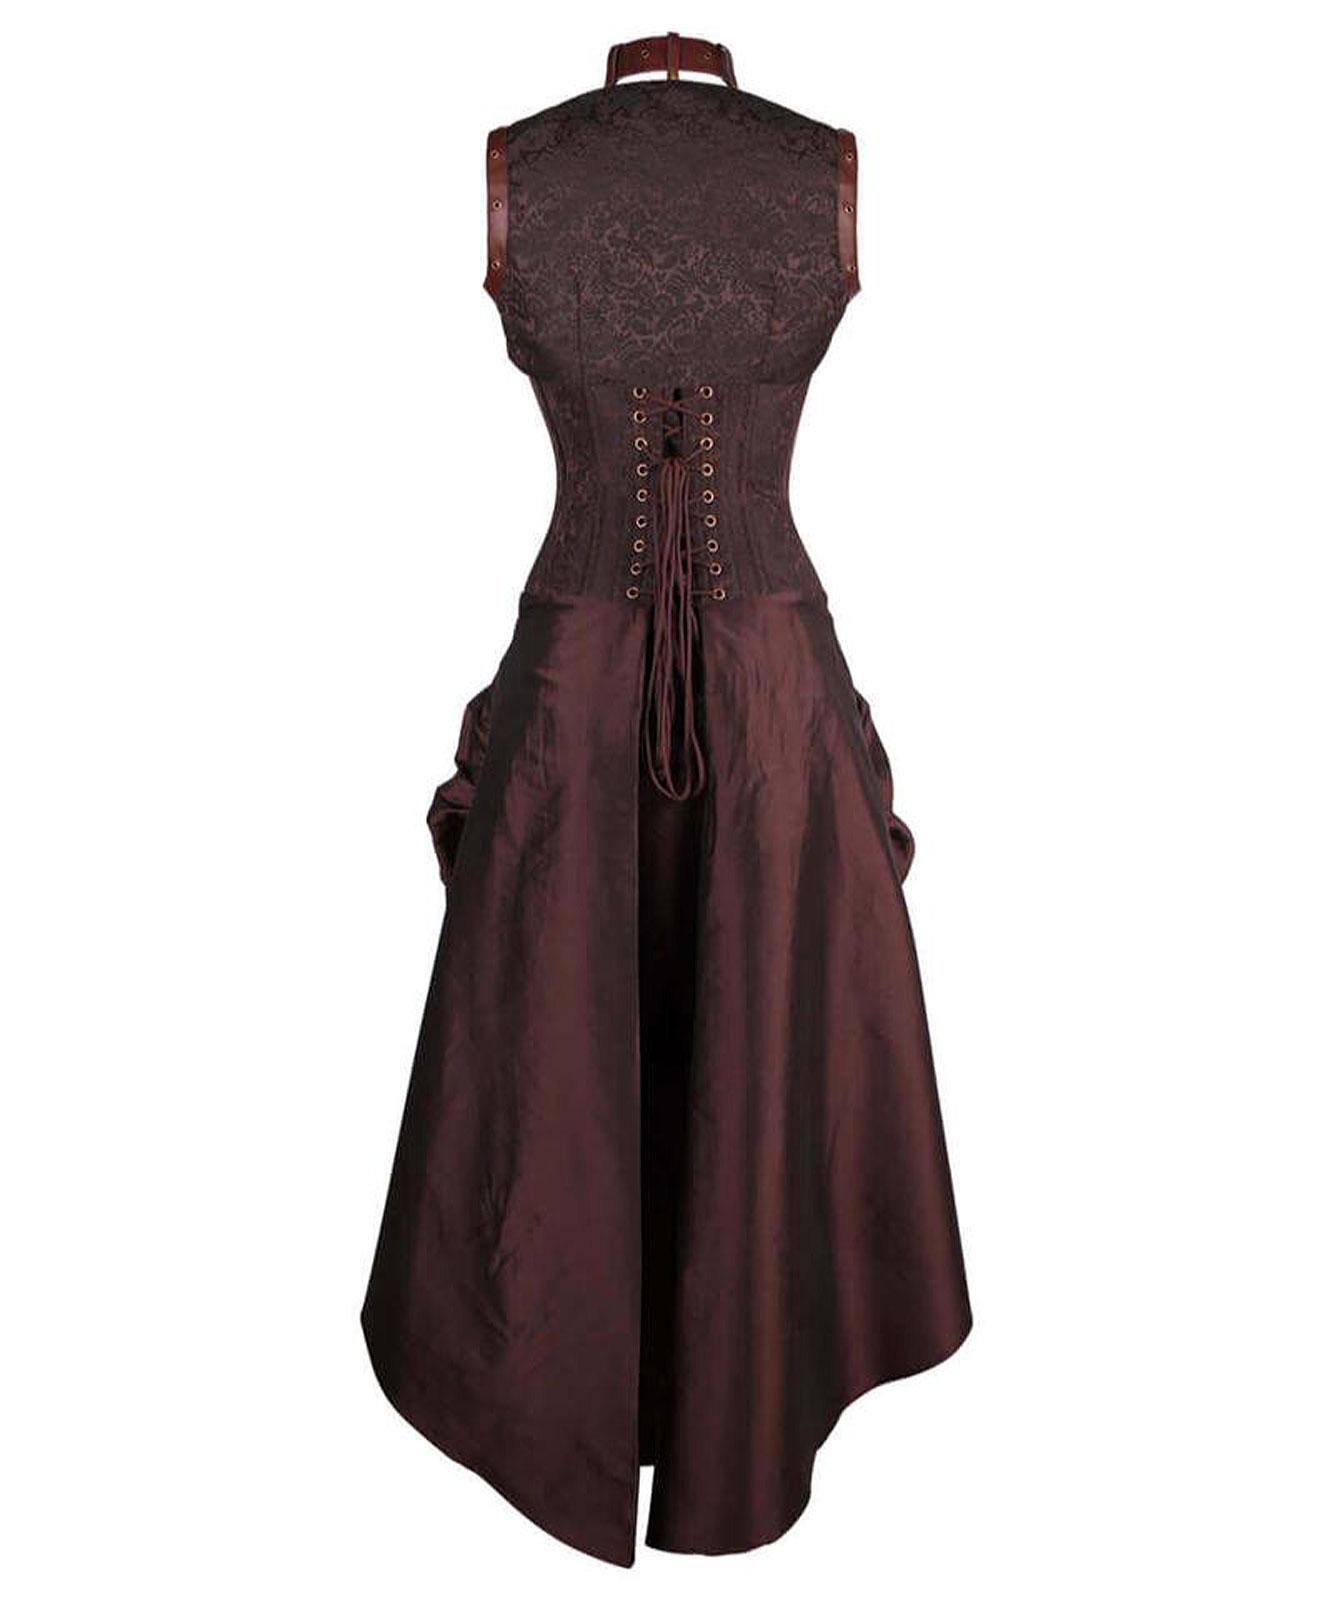 Braunes knielanges kleid